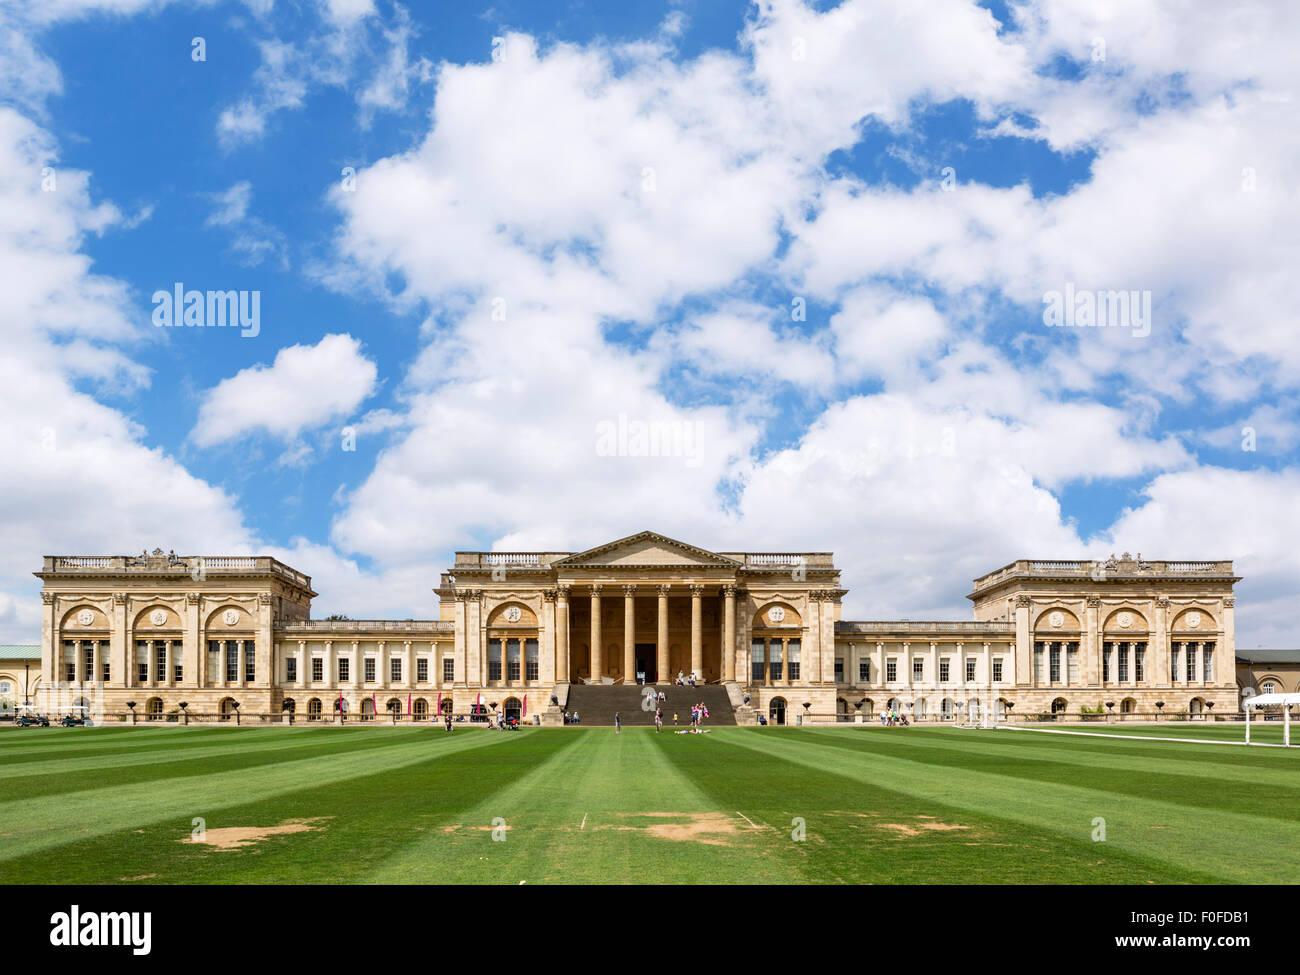 The southern facade of Stowe House, Buckinghamshire, England, UK - Stock Image